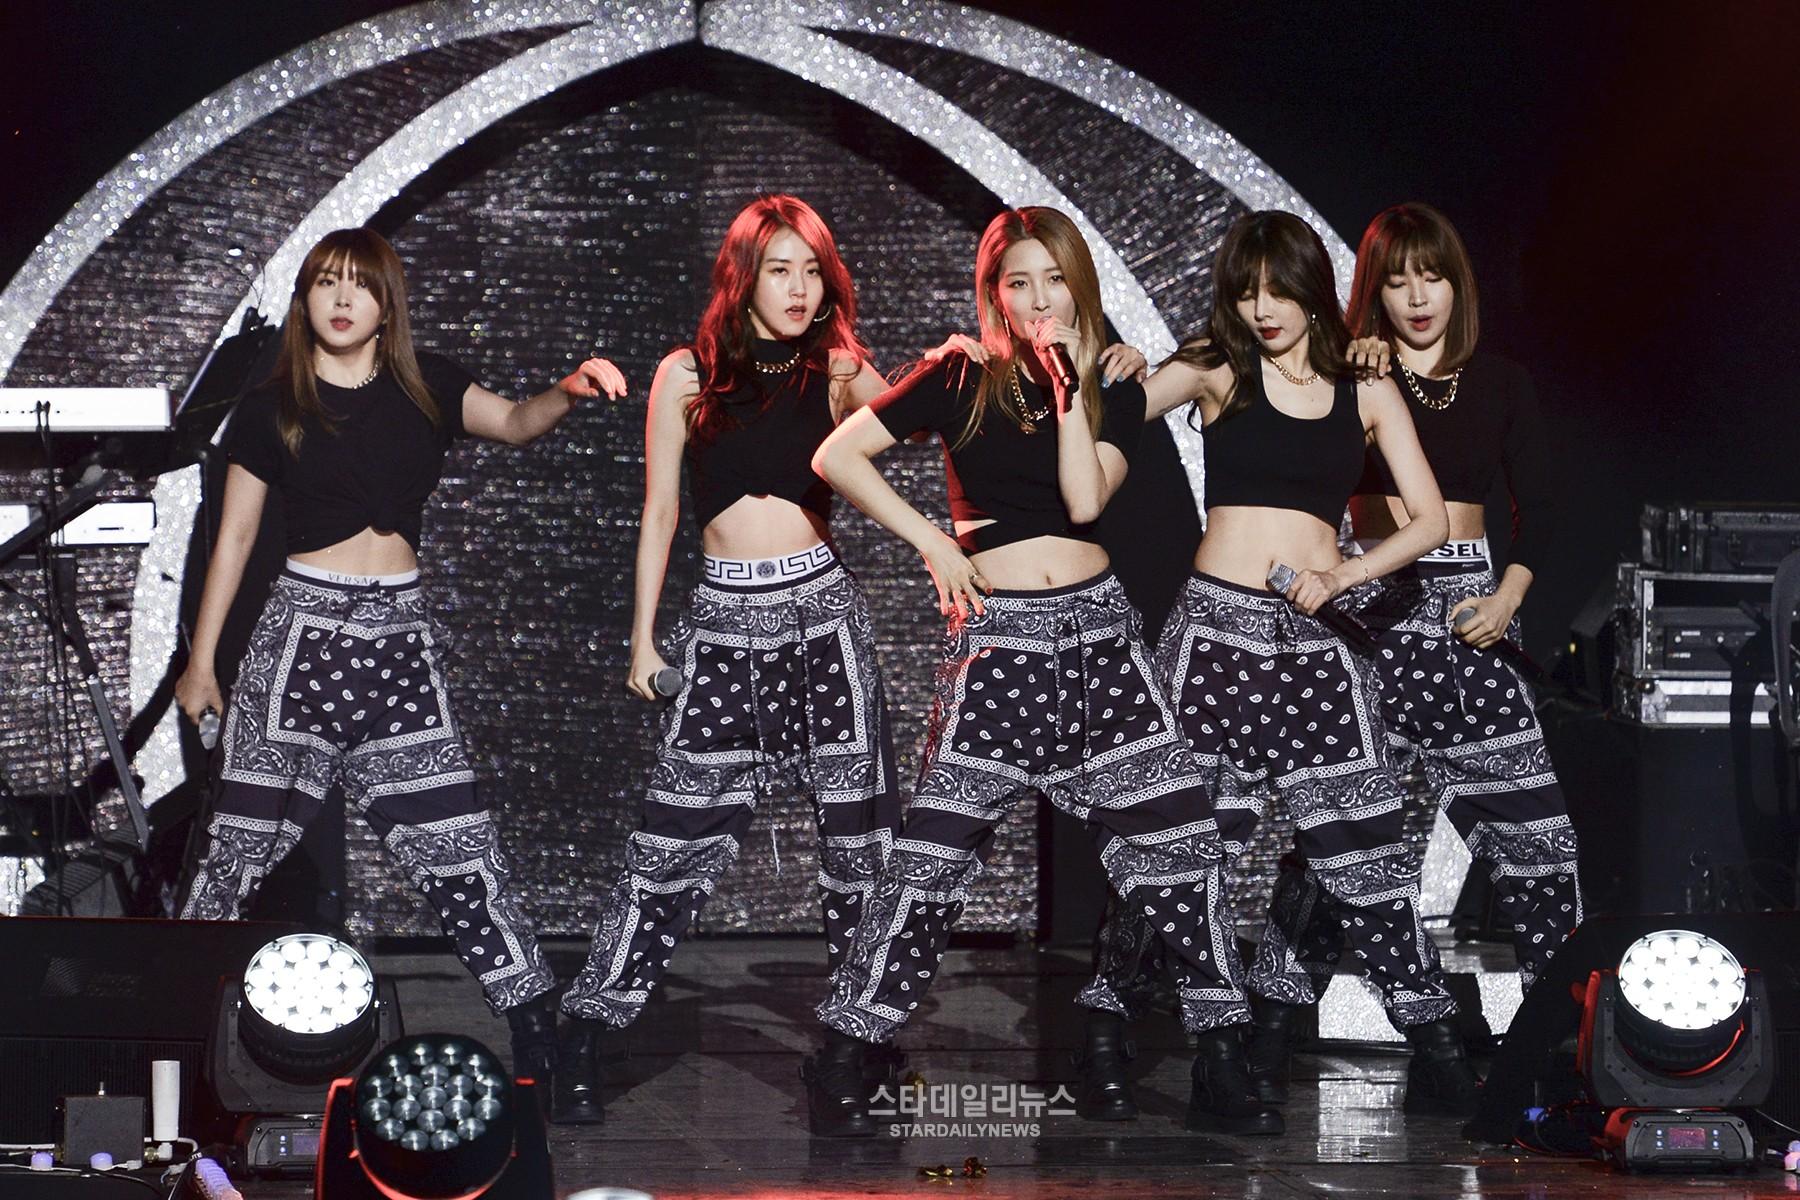 Representantes de Cube Entertainment dicen que 4Minute ha decidido separarse